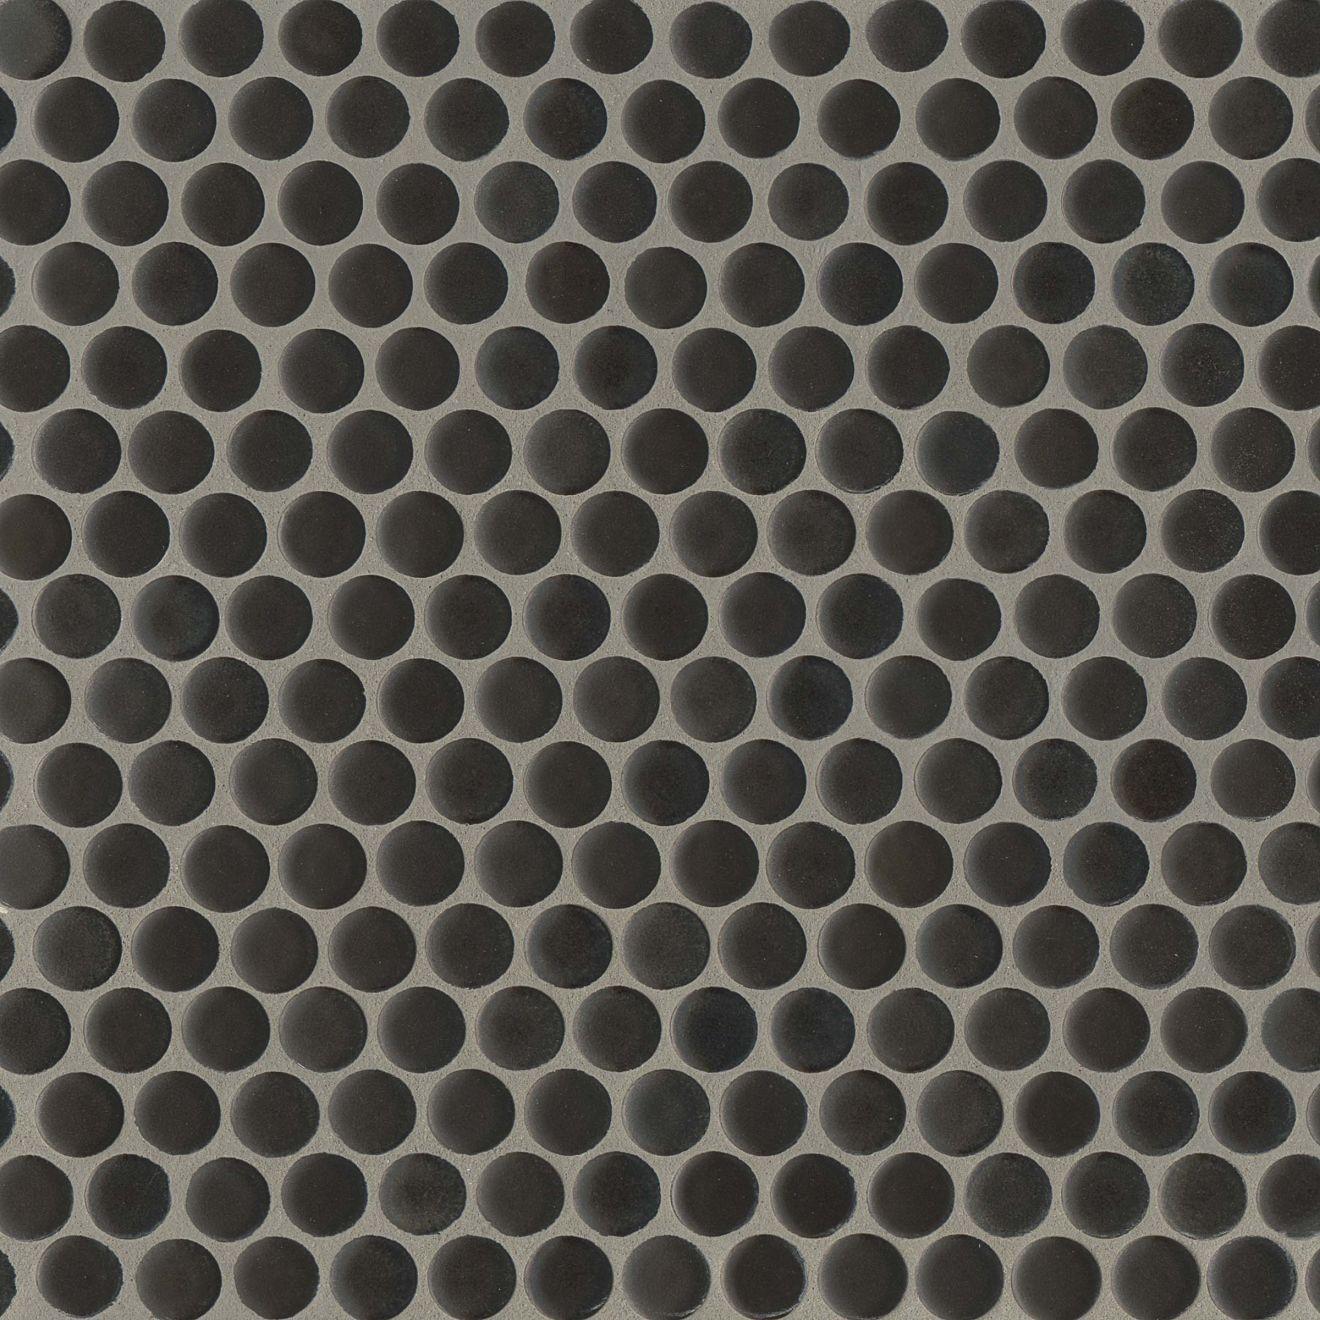 "360 3/4"" x 3/4"" Floor & Wall Mosaic in Charcoal"